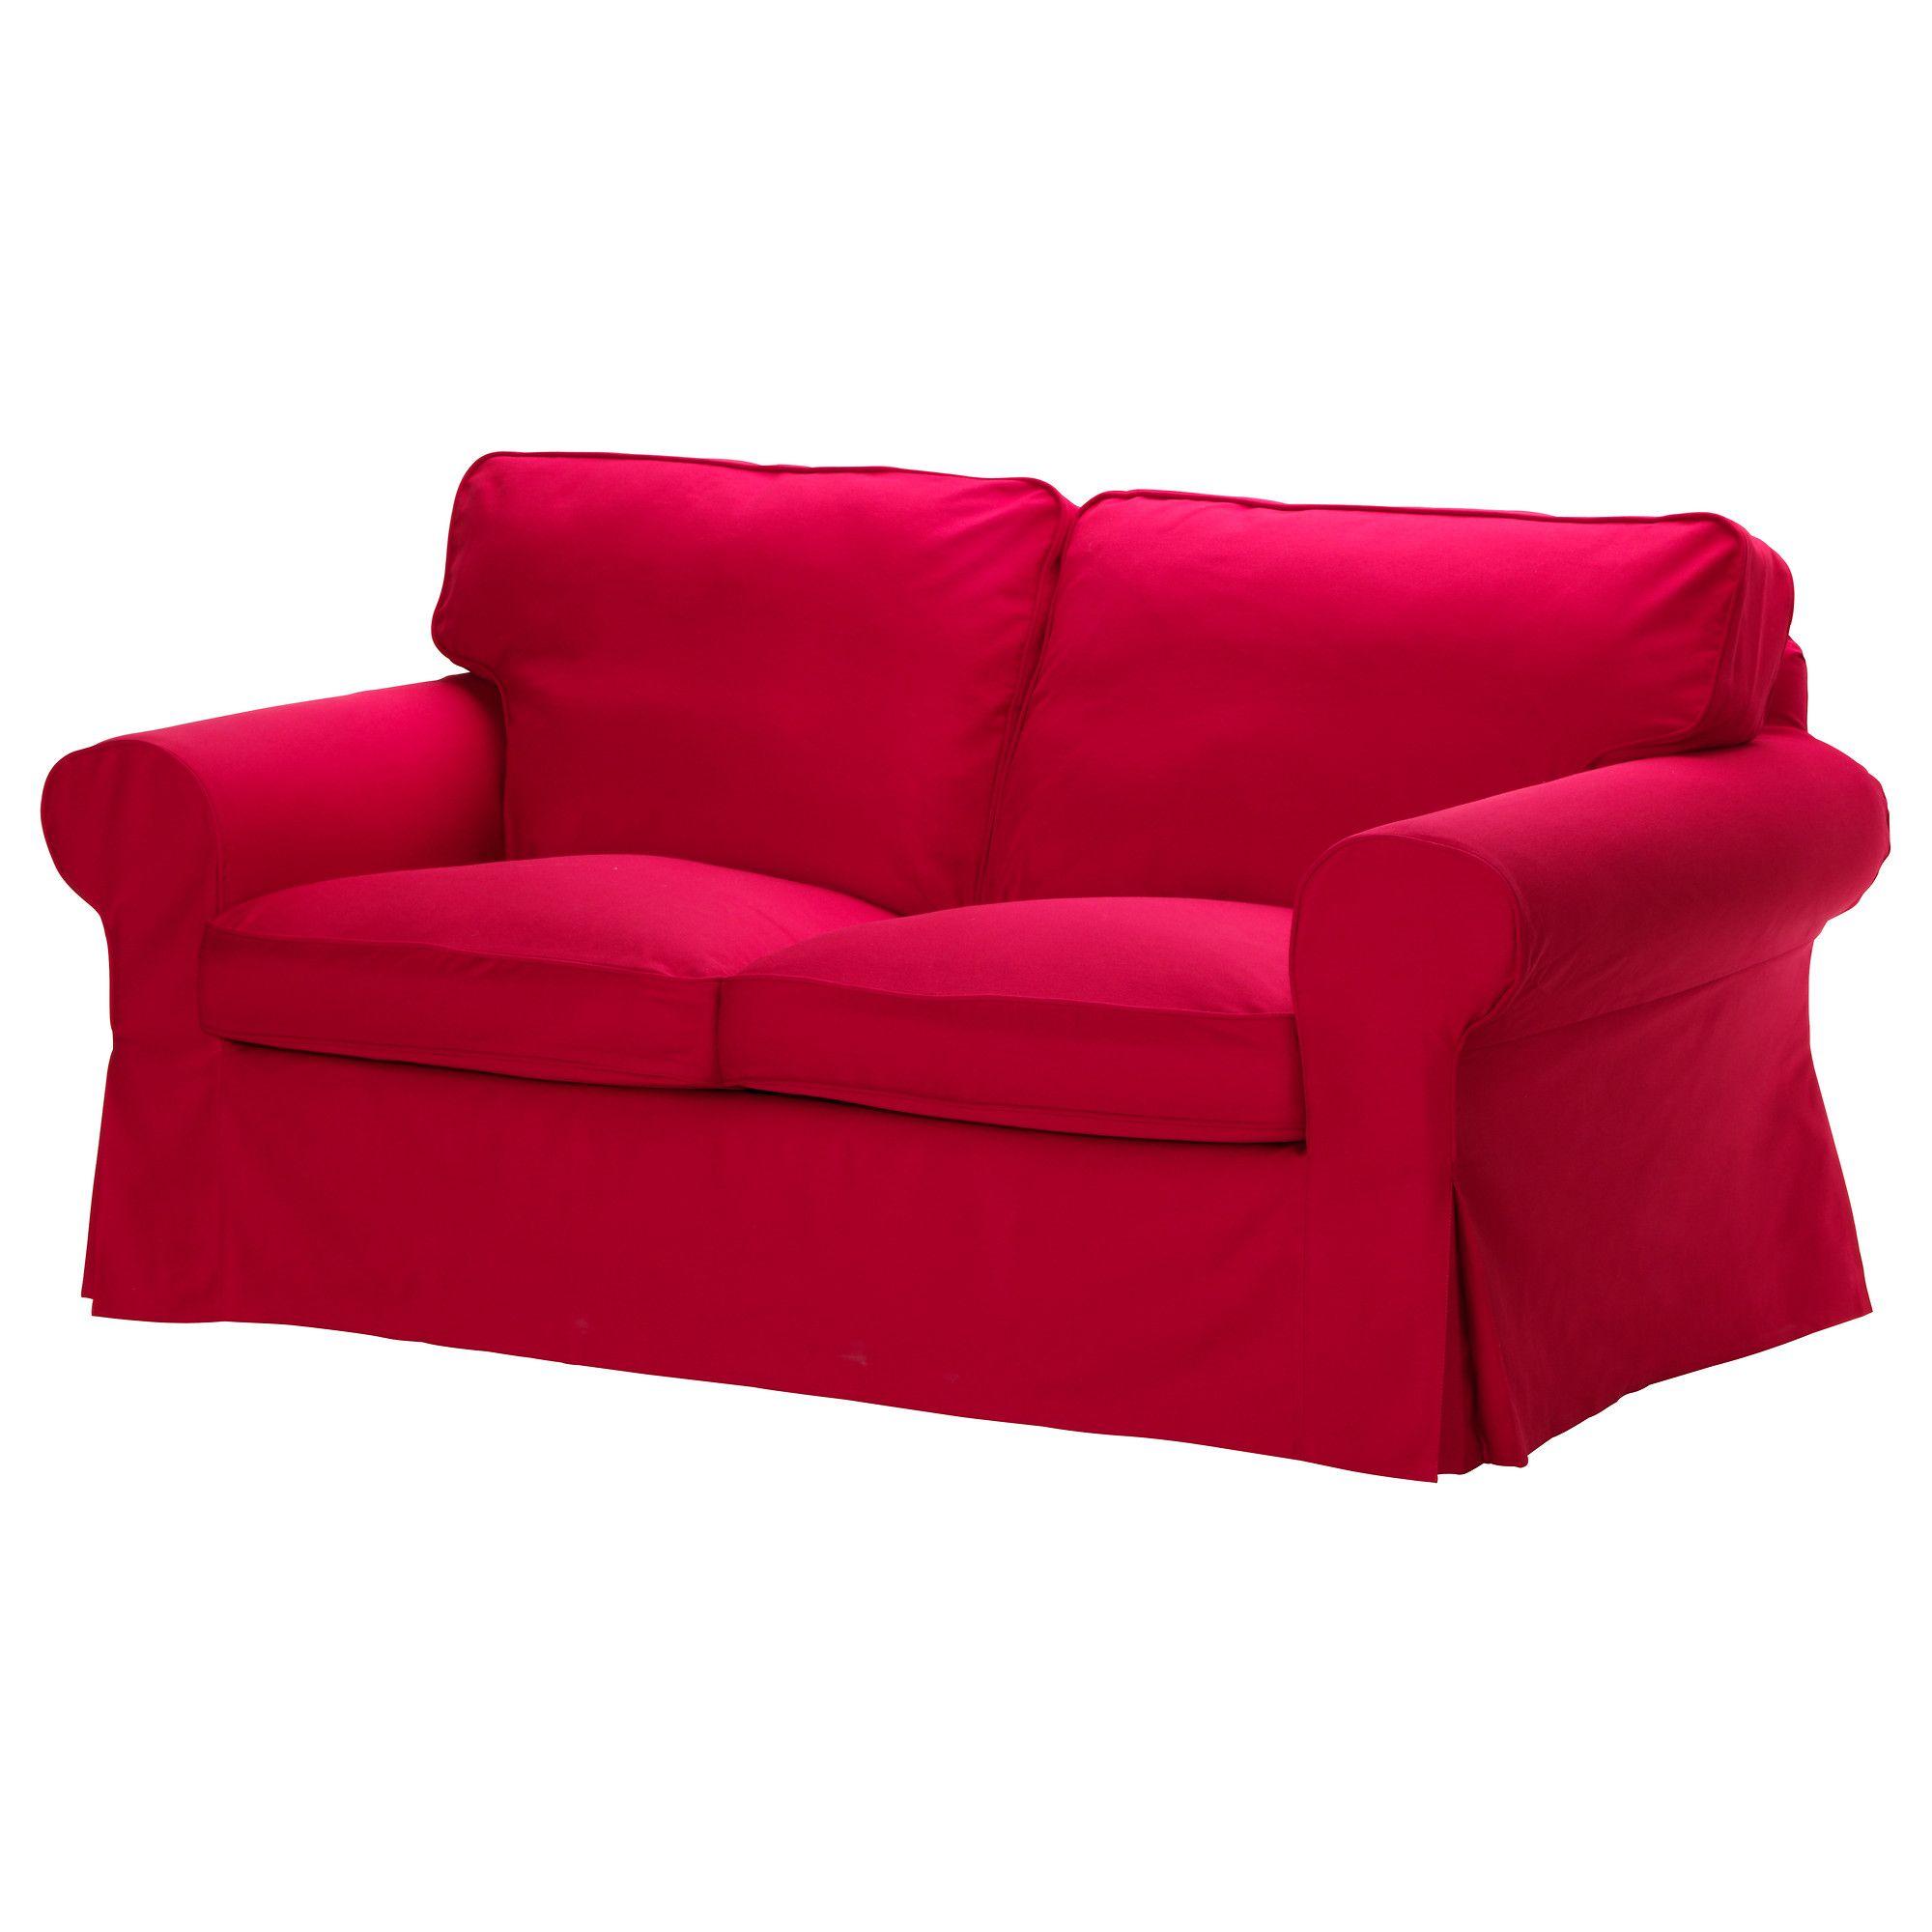 Ektorp Loveseat Cover Idemo Red Ikea So Roomy Ikea Sofa Ektorp Sofa Ikea Loveseat